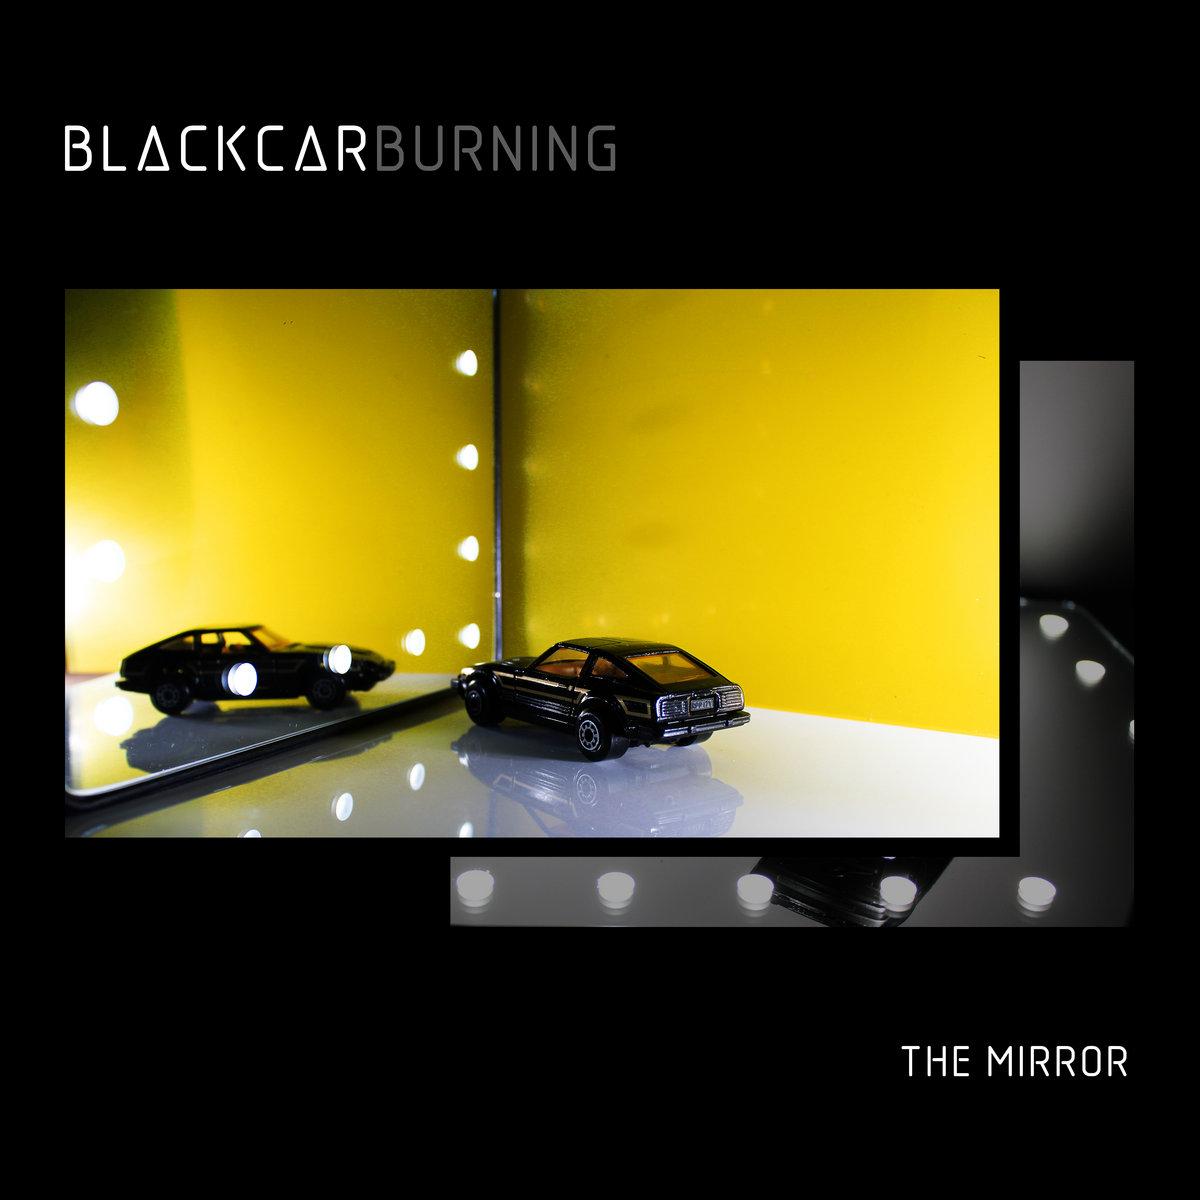 Blackcarburning - The Mirror - Blackcarburning - The Mirror